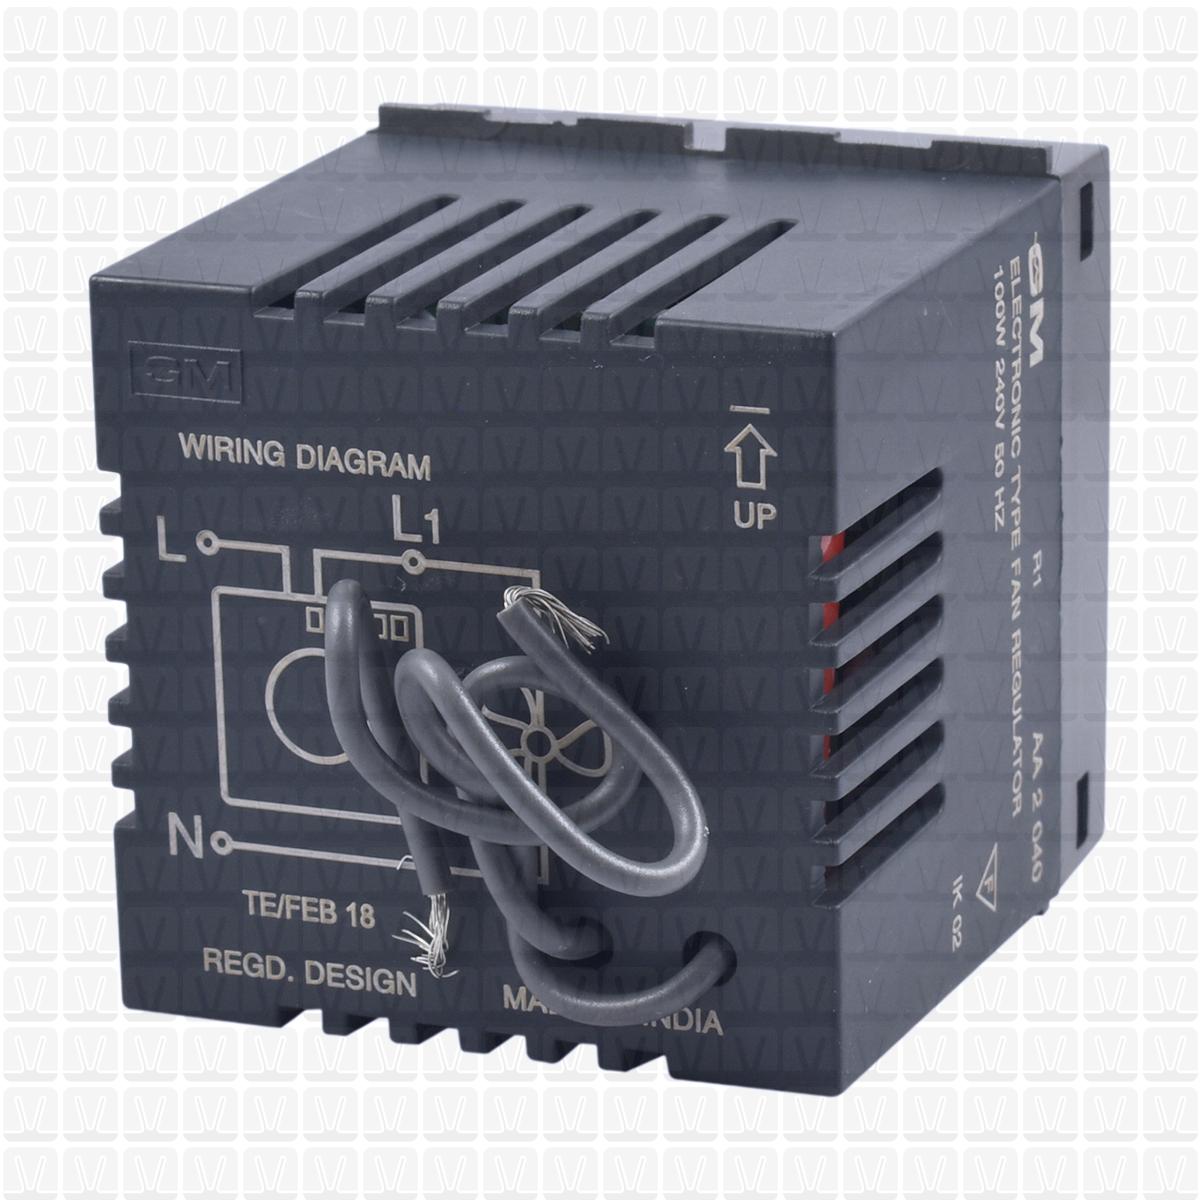 Gm Magnesia Regularor 2 Module Ragulator Vardhman Shop Regulator Wiring